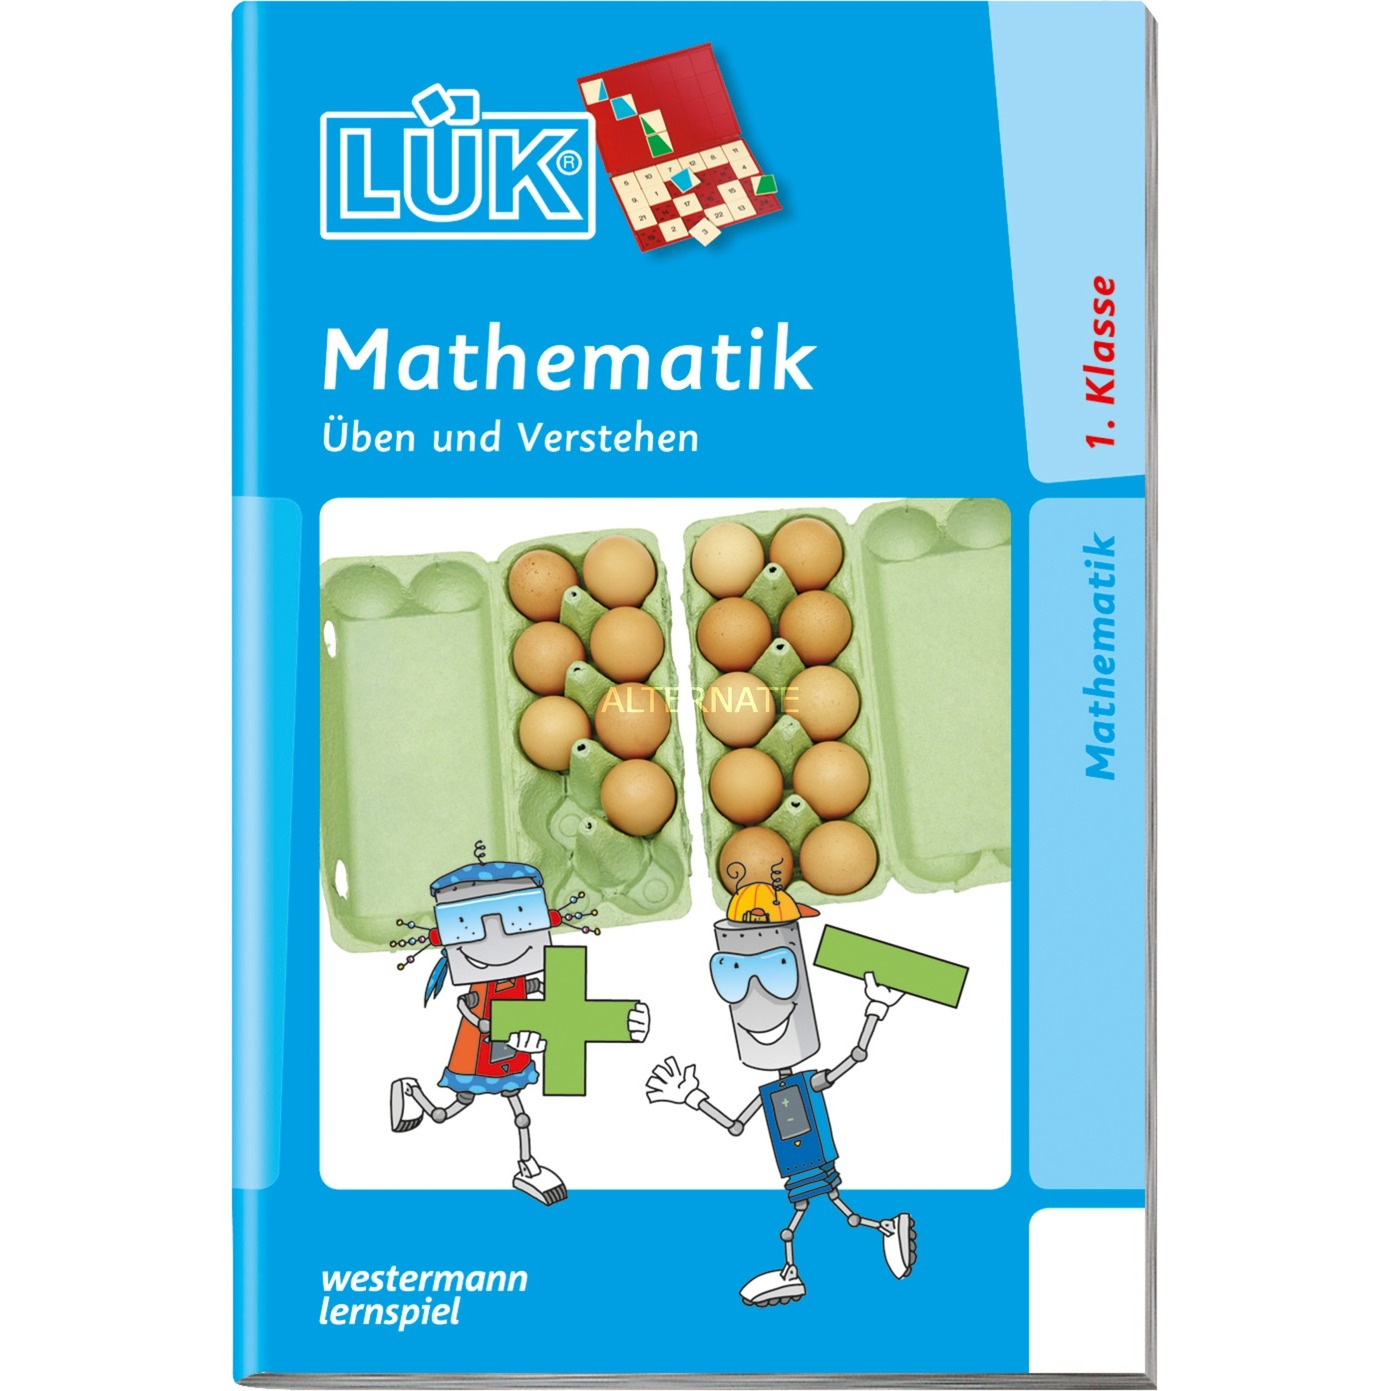 Mathematik 1. Klasse Üben und Verstehen livre pour enfants, Manuel